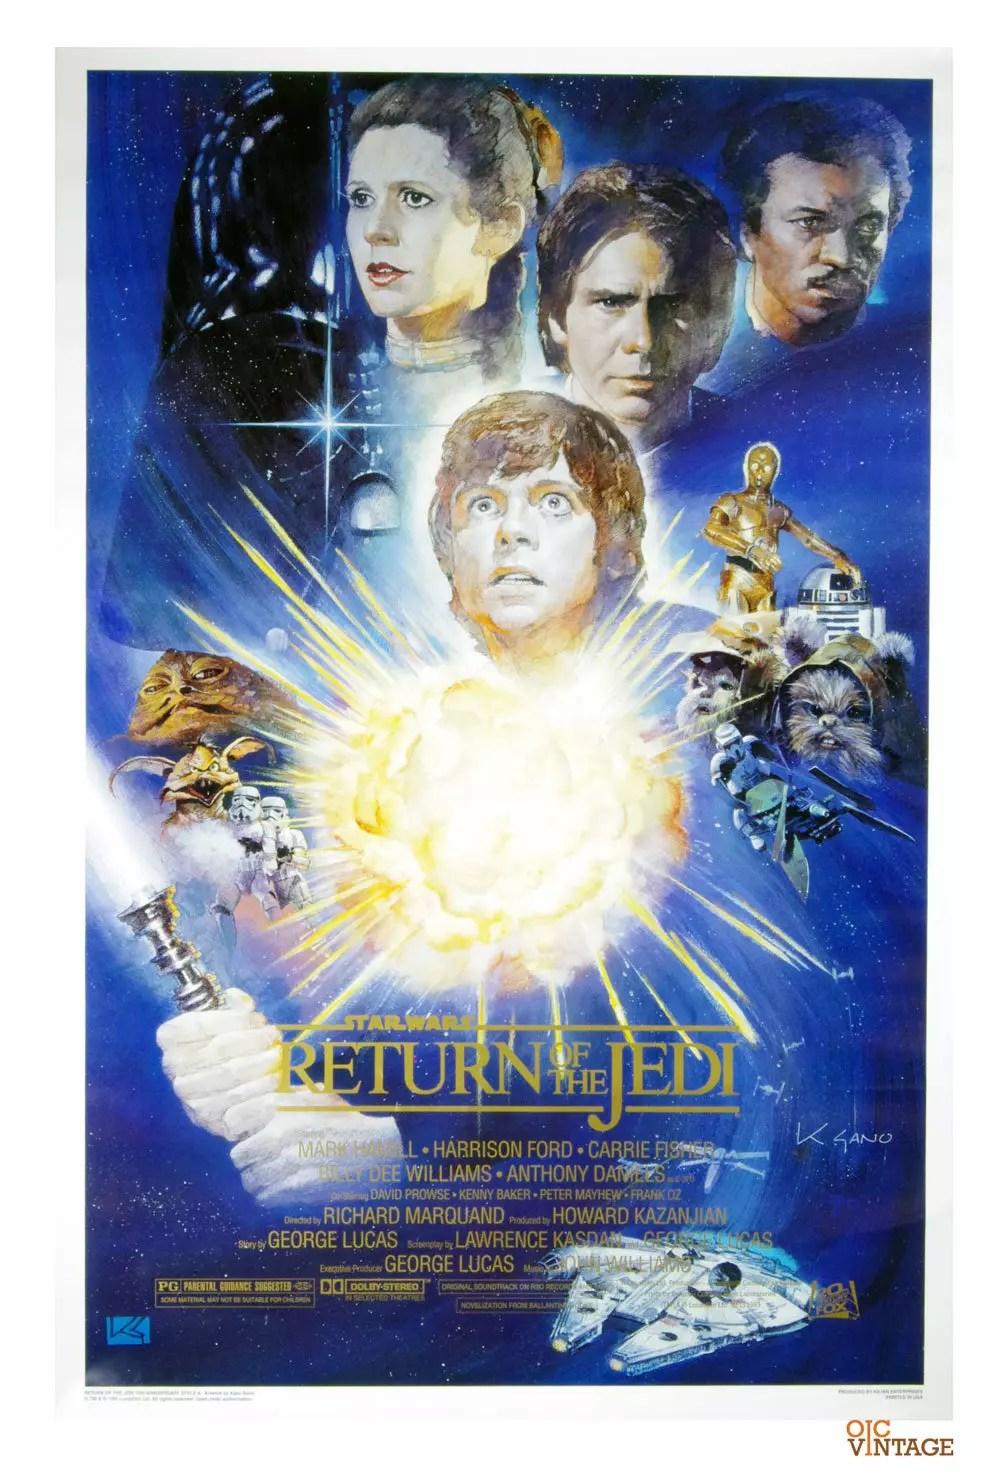 Star Wars Return Of The Jedi Poster 1994 Kazu Sano w/ Certificate of Authenticity  27x41